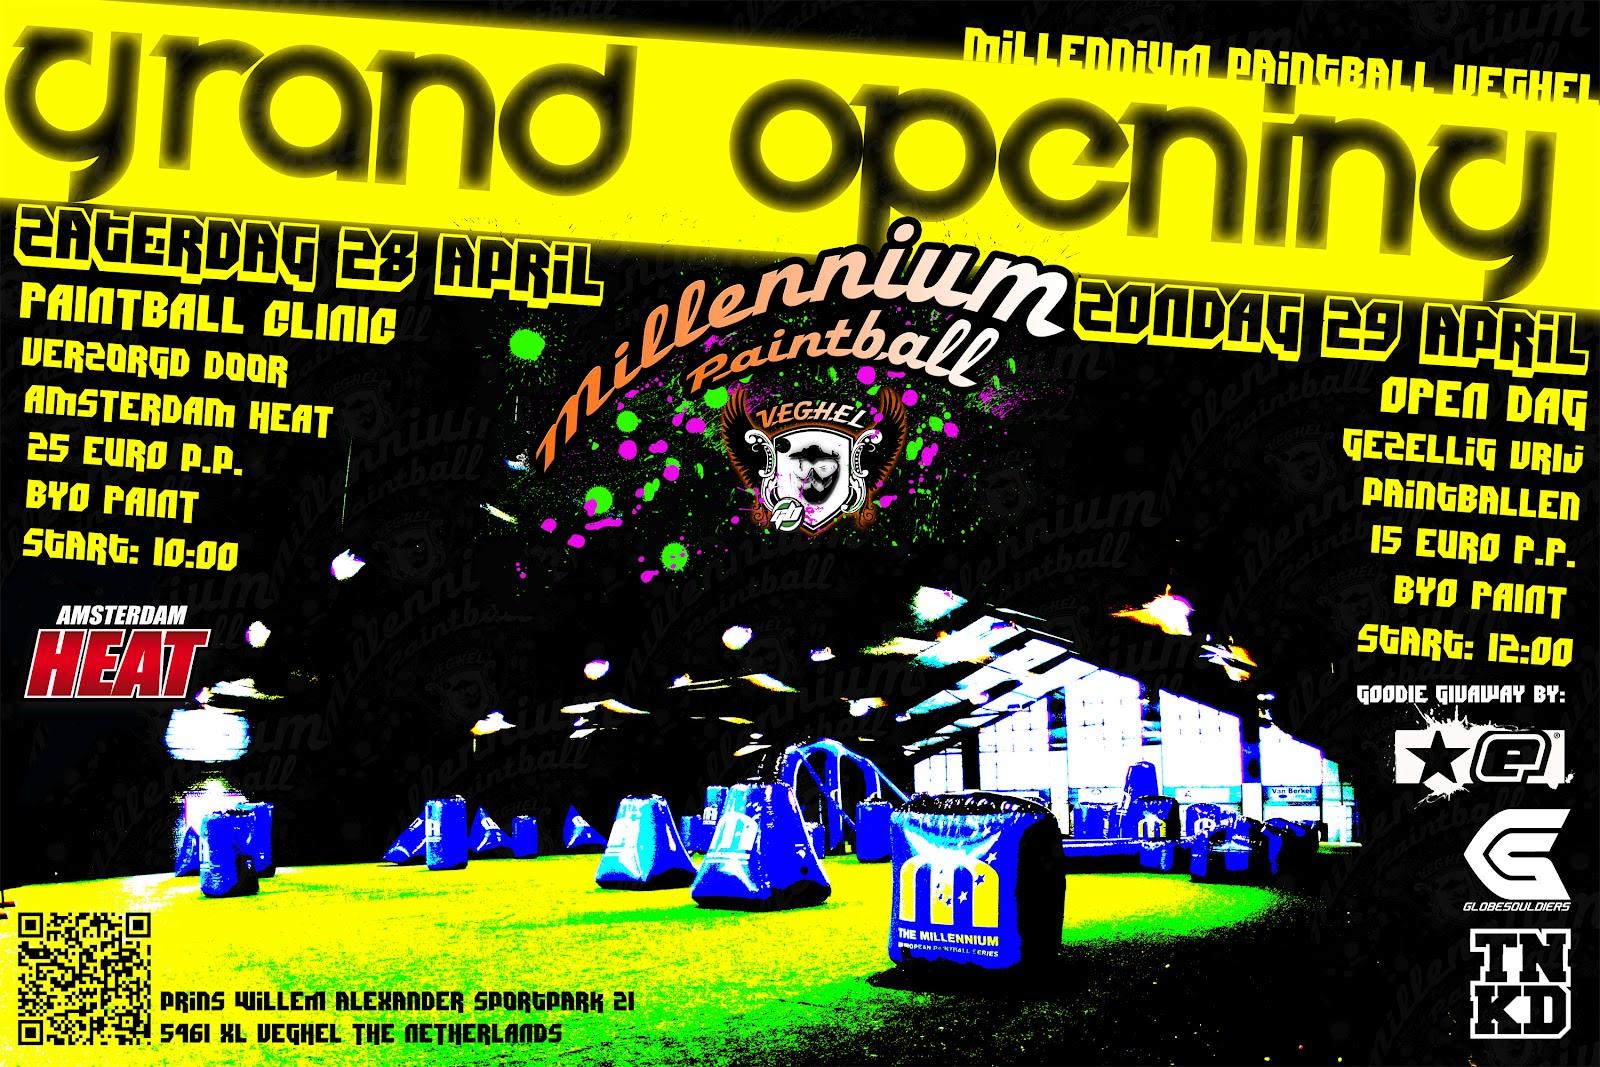 eclipse casino grand opening